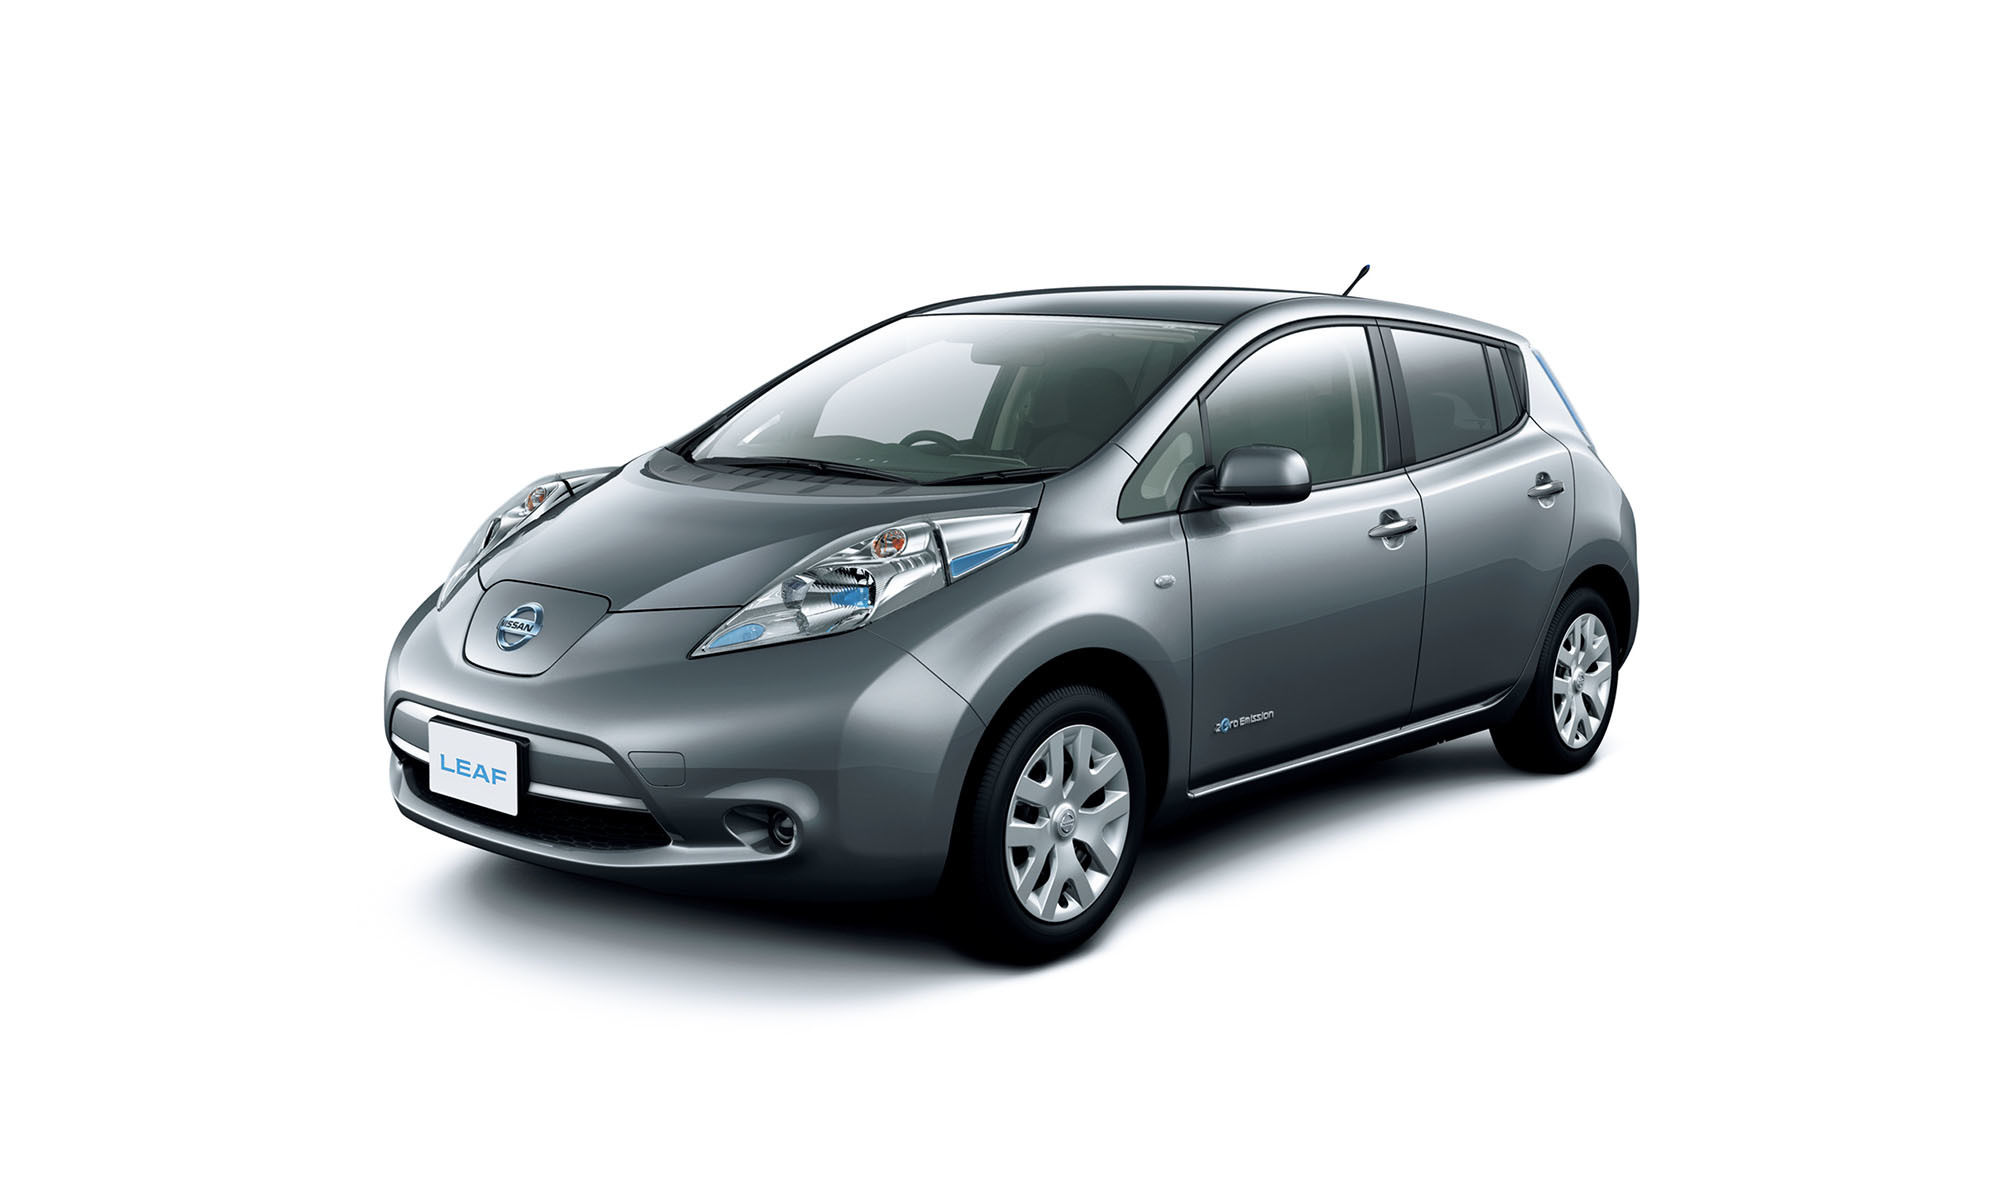 Nissan LEAF 30kWh (2015)